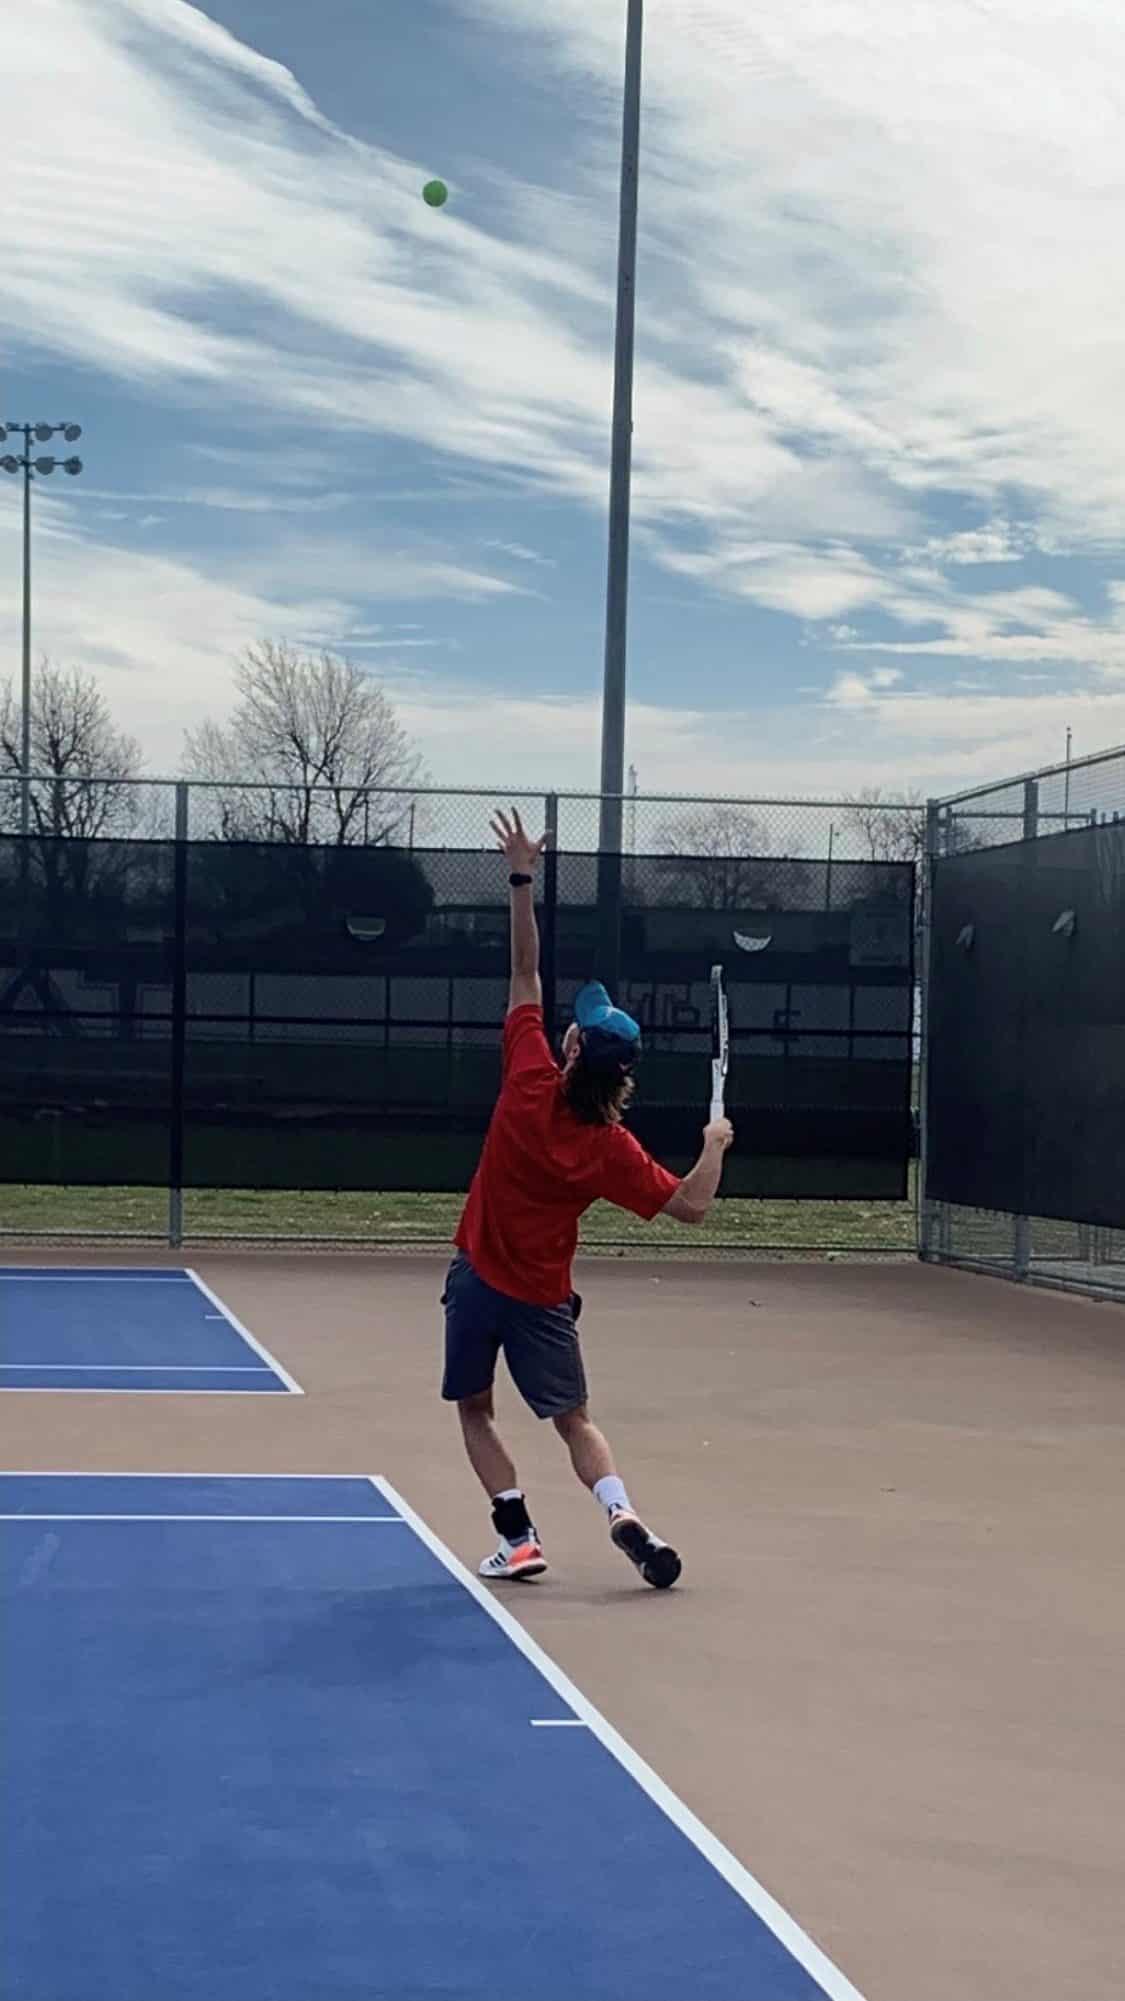 Luke Henley on the tennis court